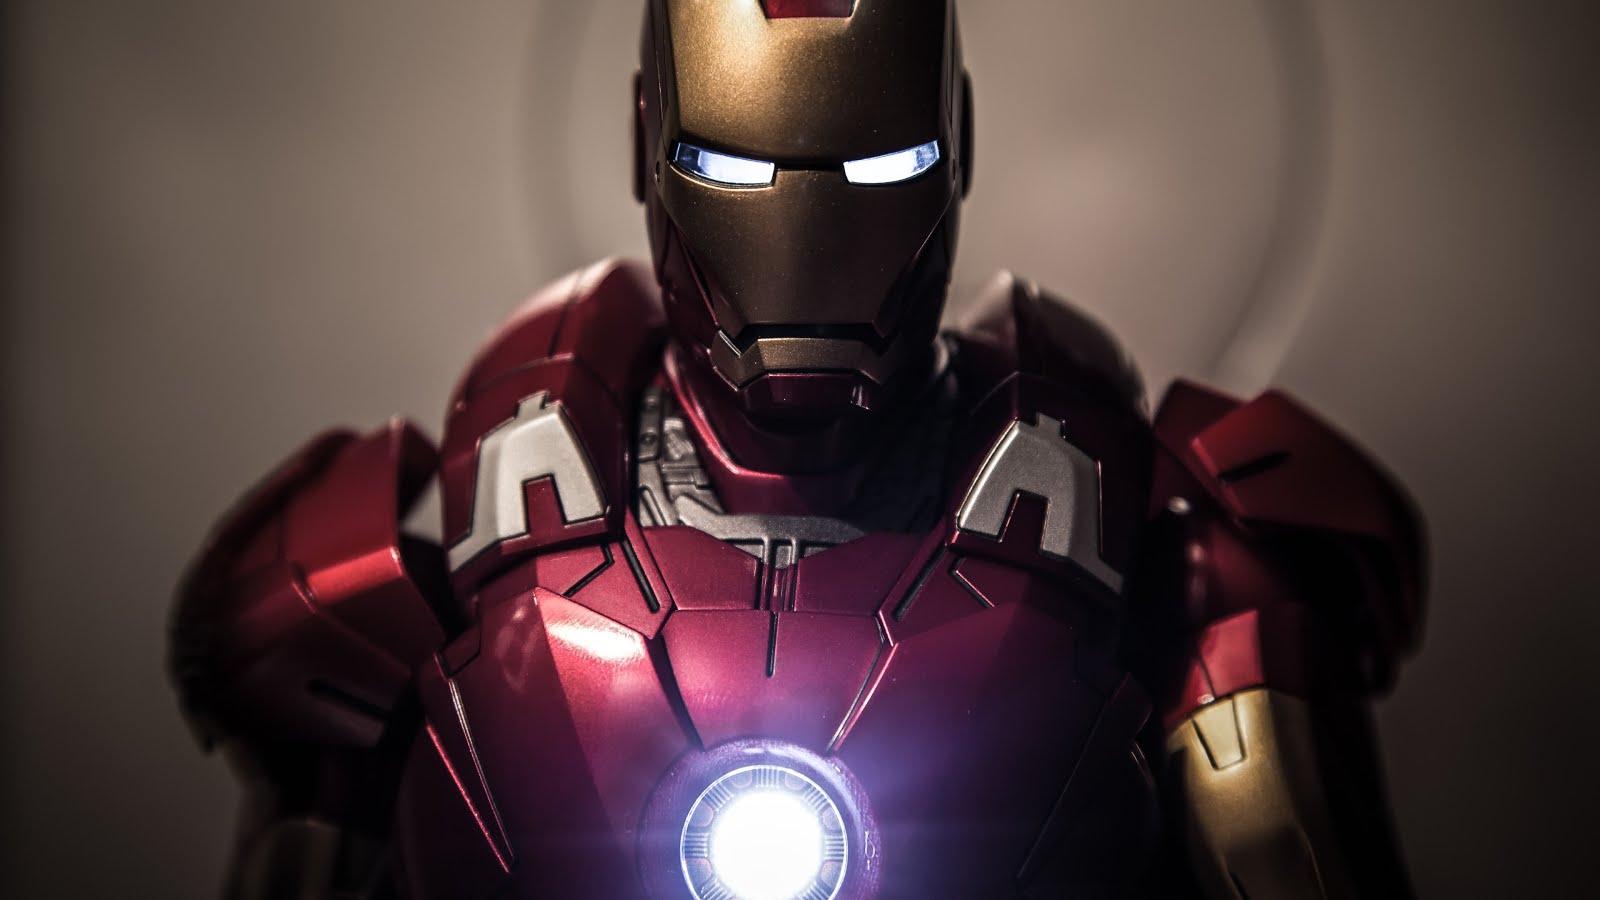 My Fav Superhero